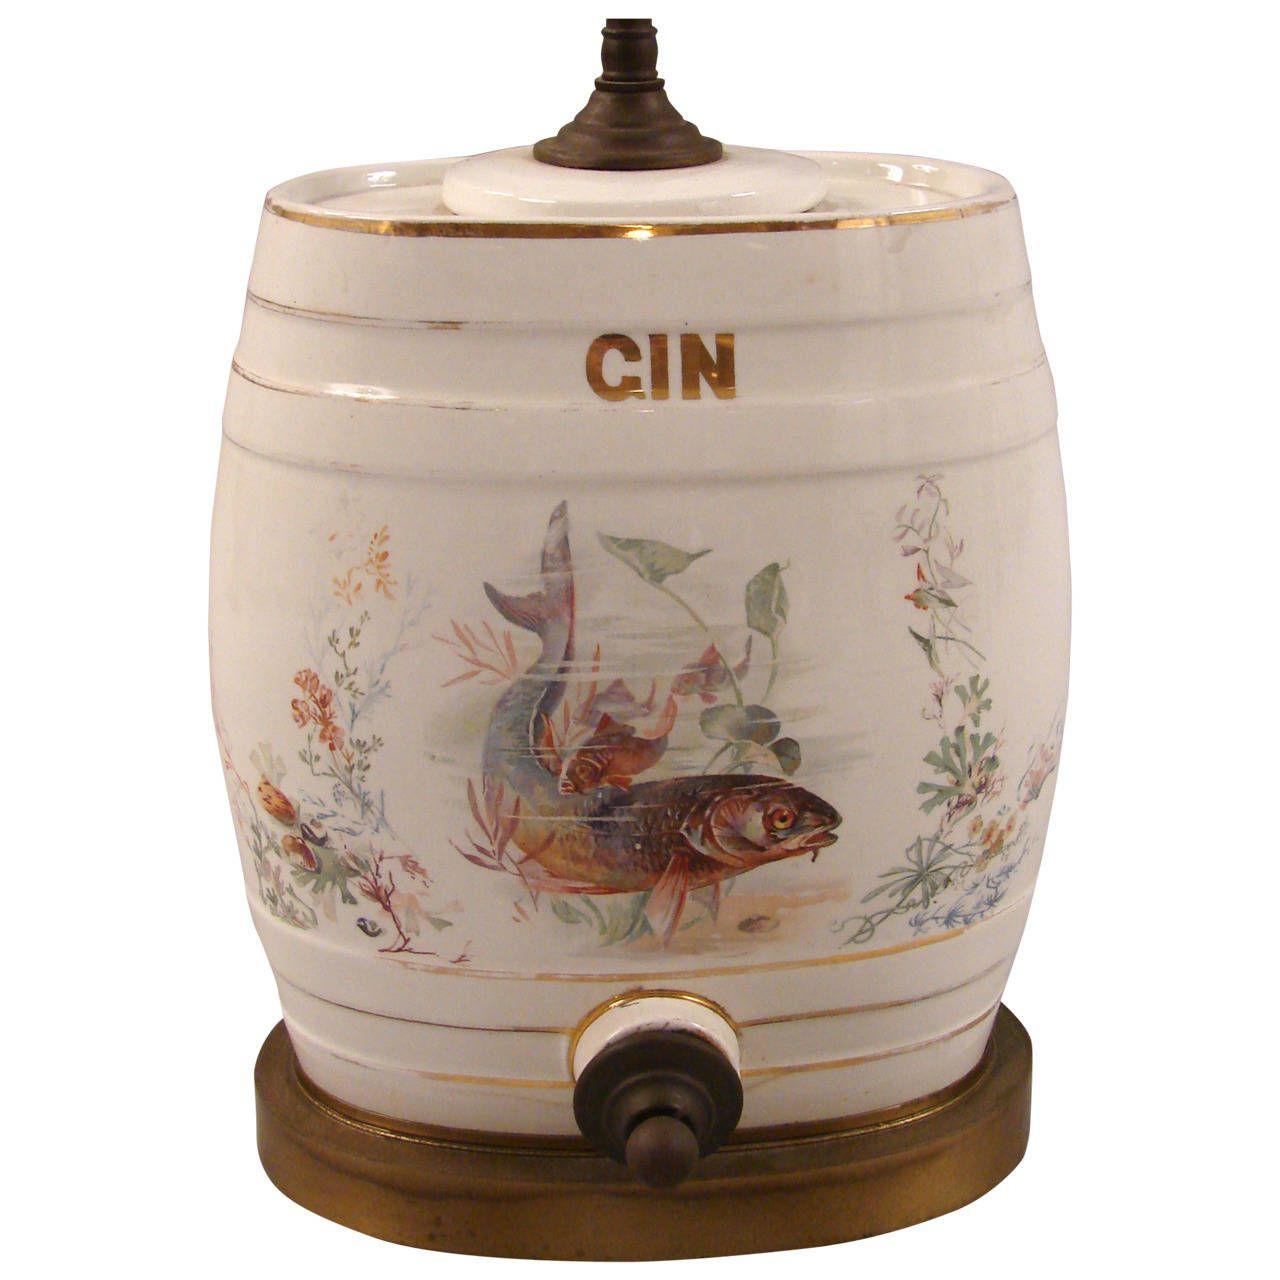 belleek ireland vase value of antique english stoneware gin barrel circa 1870s earthenwares inside c6f2bd38e30e53f3d3cf6e2b59ec13c9